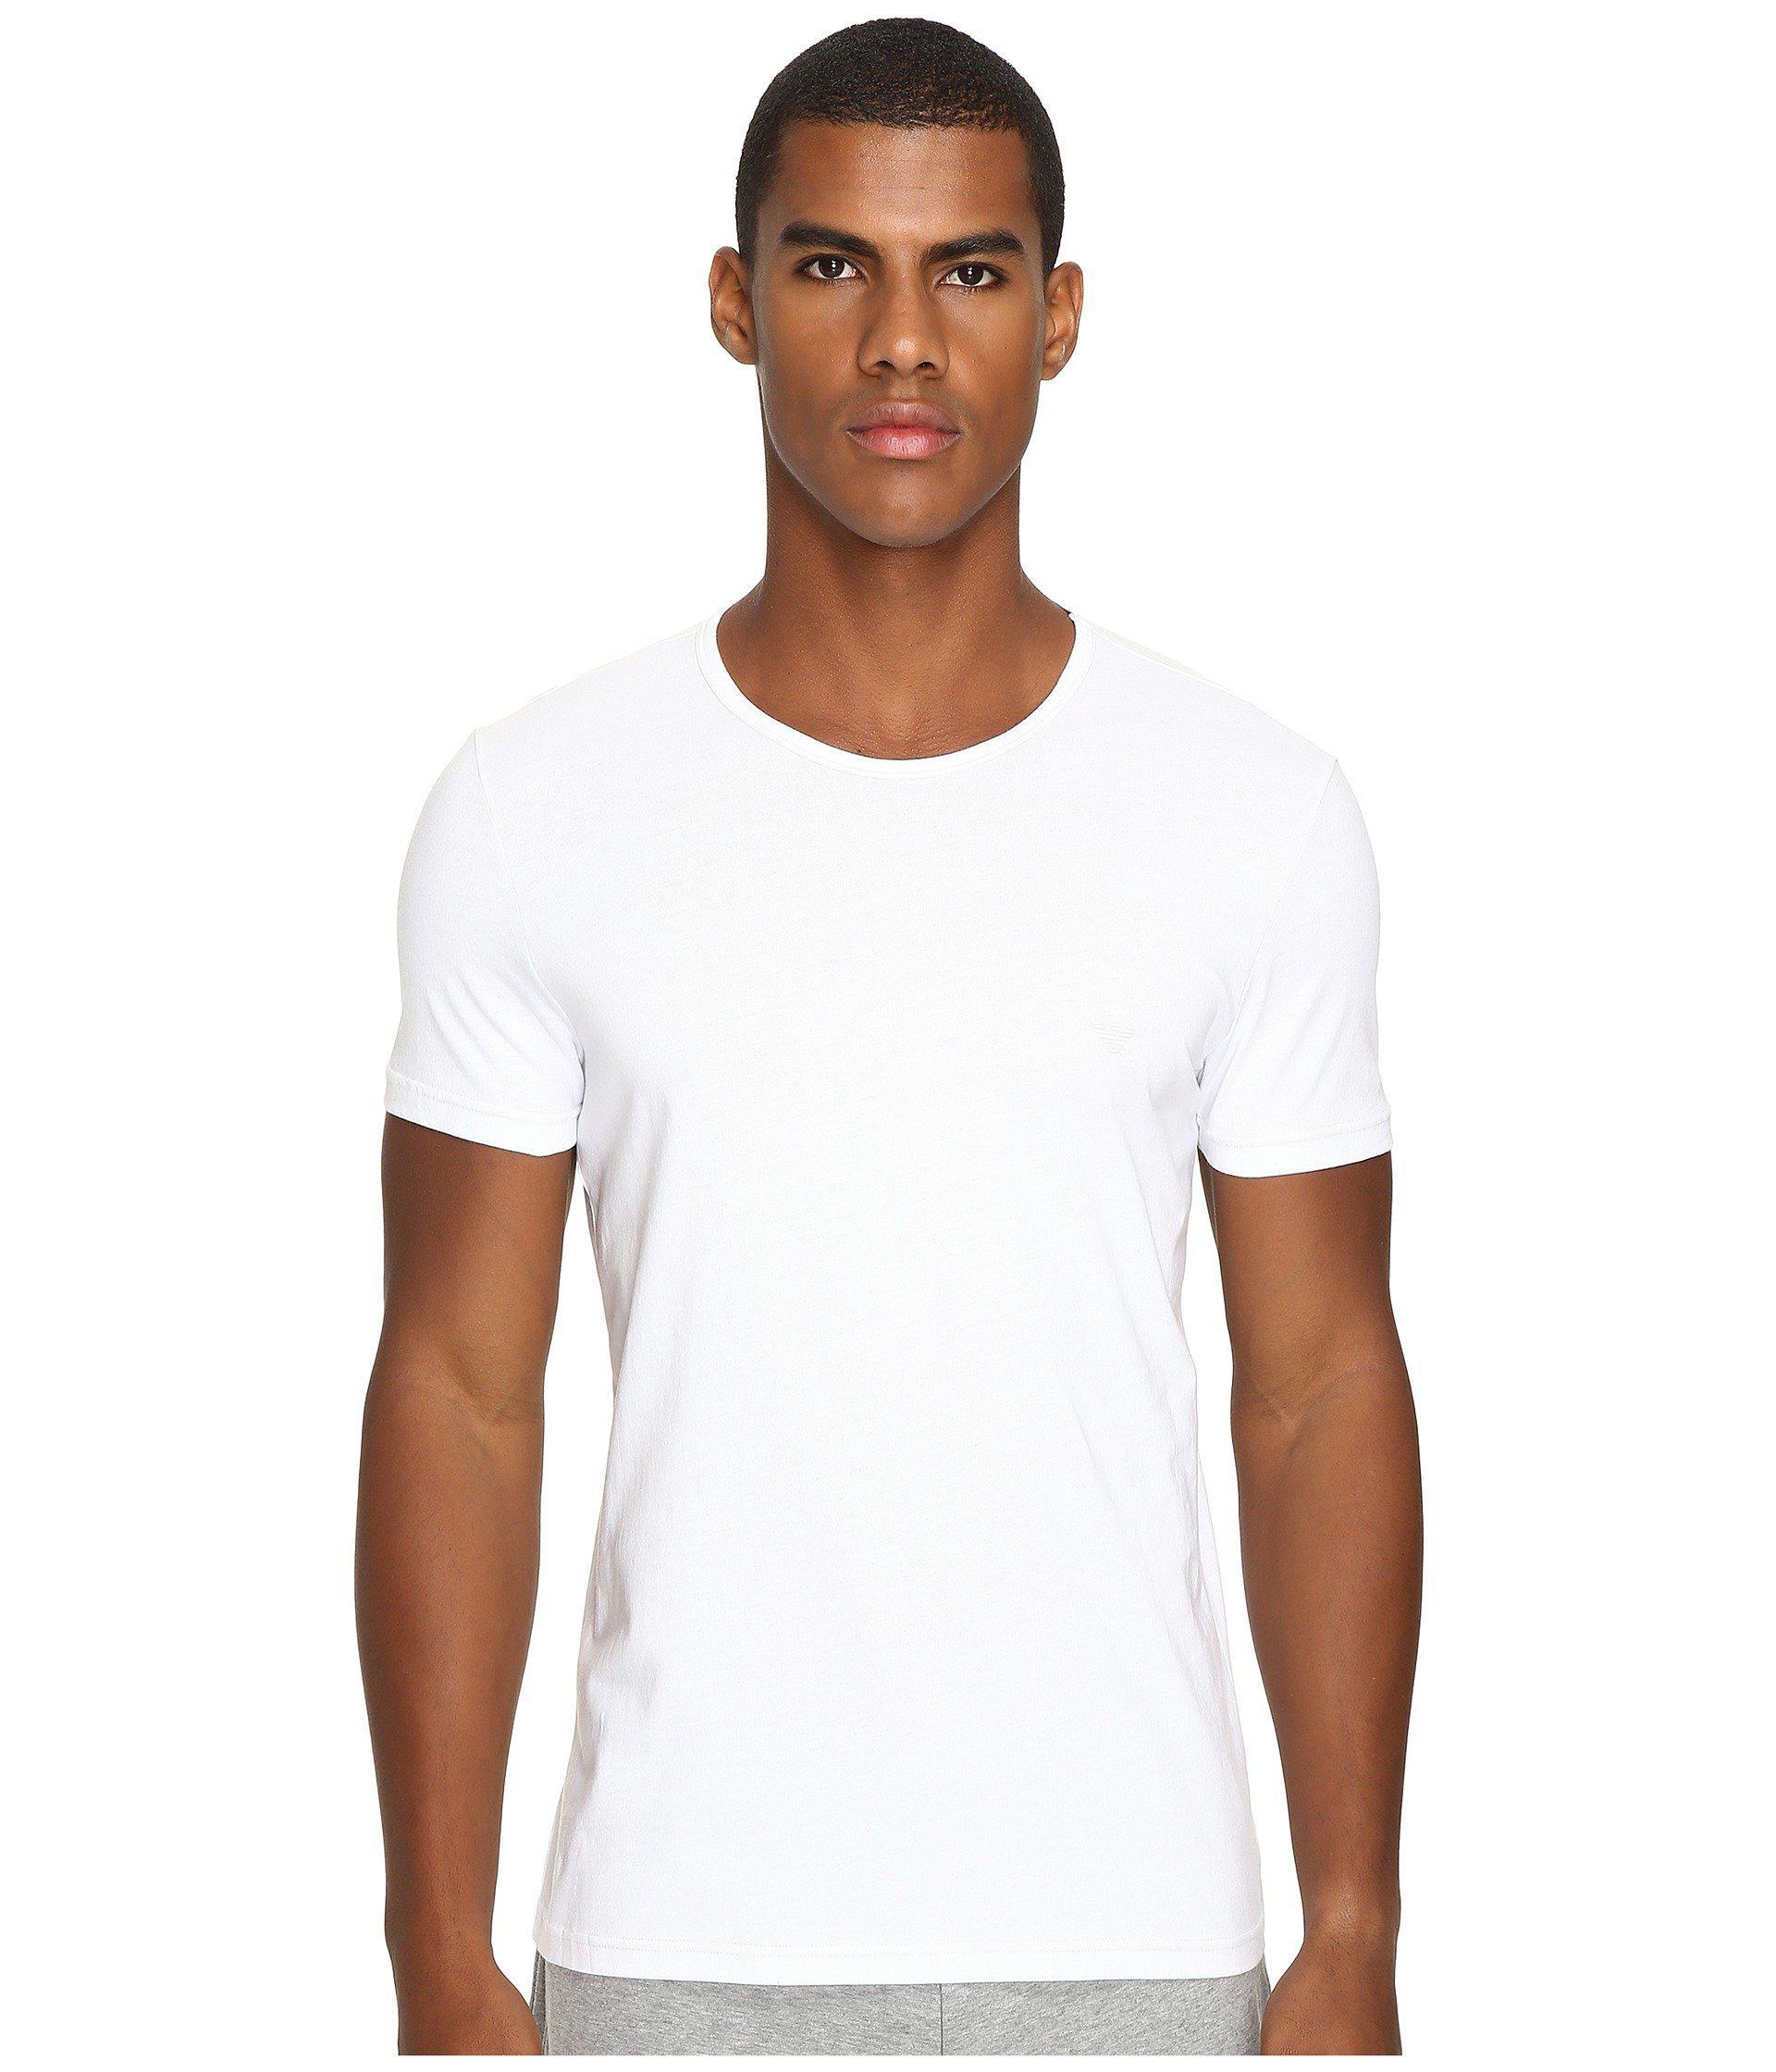 ecdf2a47d08c Lyst - Emporio Armani 3-pack Crew Neck T-shirt (white white white) Men s T  Shirt in Gray for Men